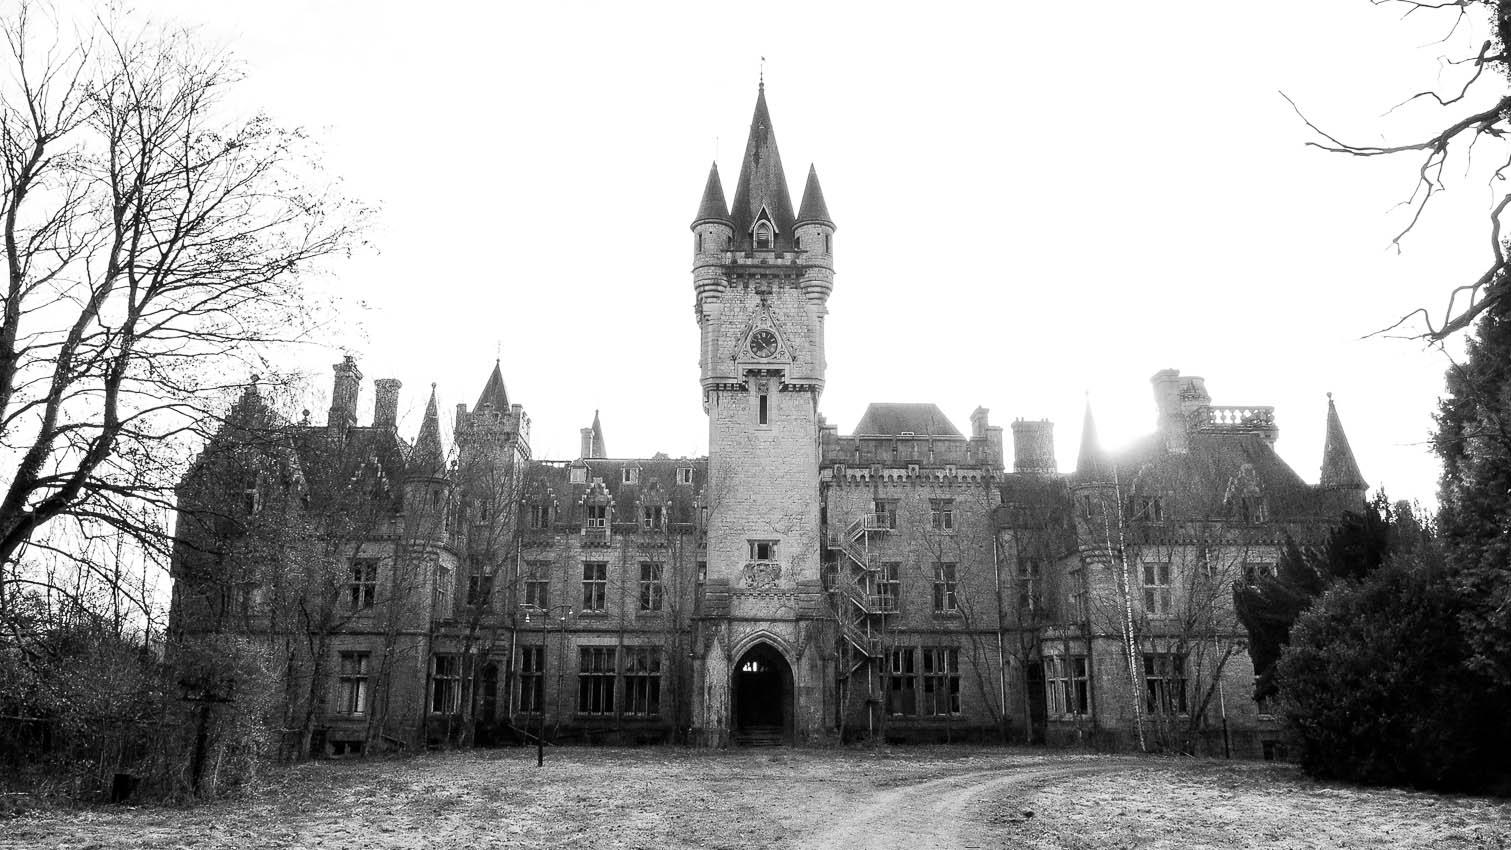 24-chateau-castel-location-vente-decors-film-cinema-photo-belgium-bruxelles